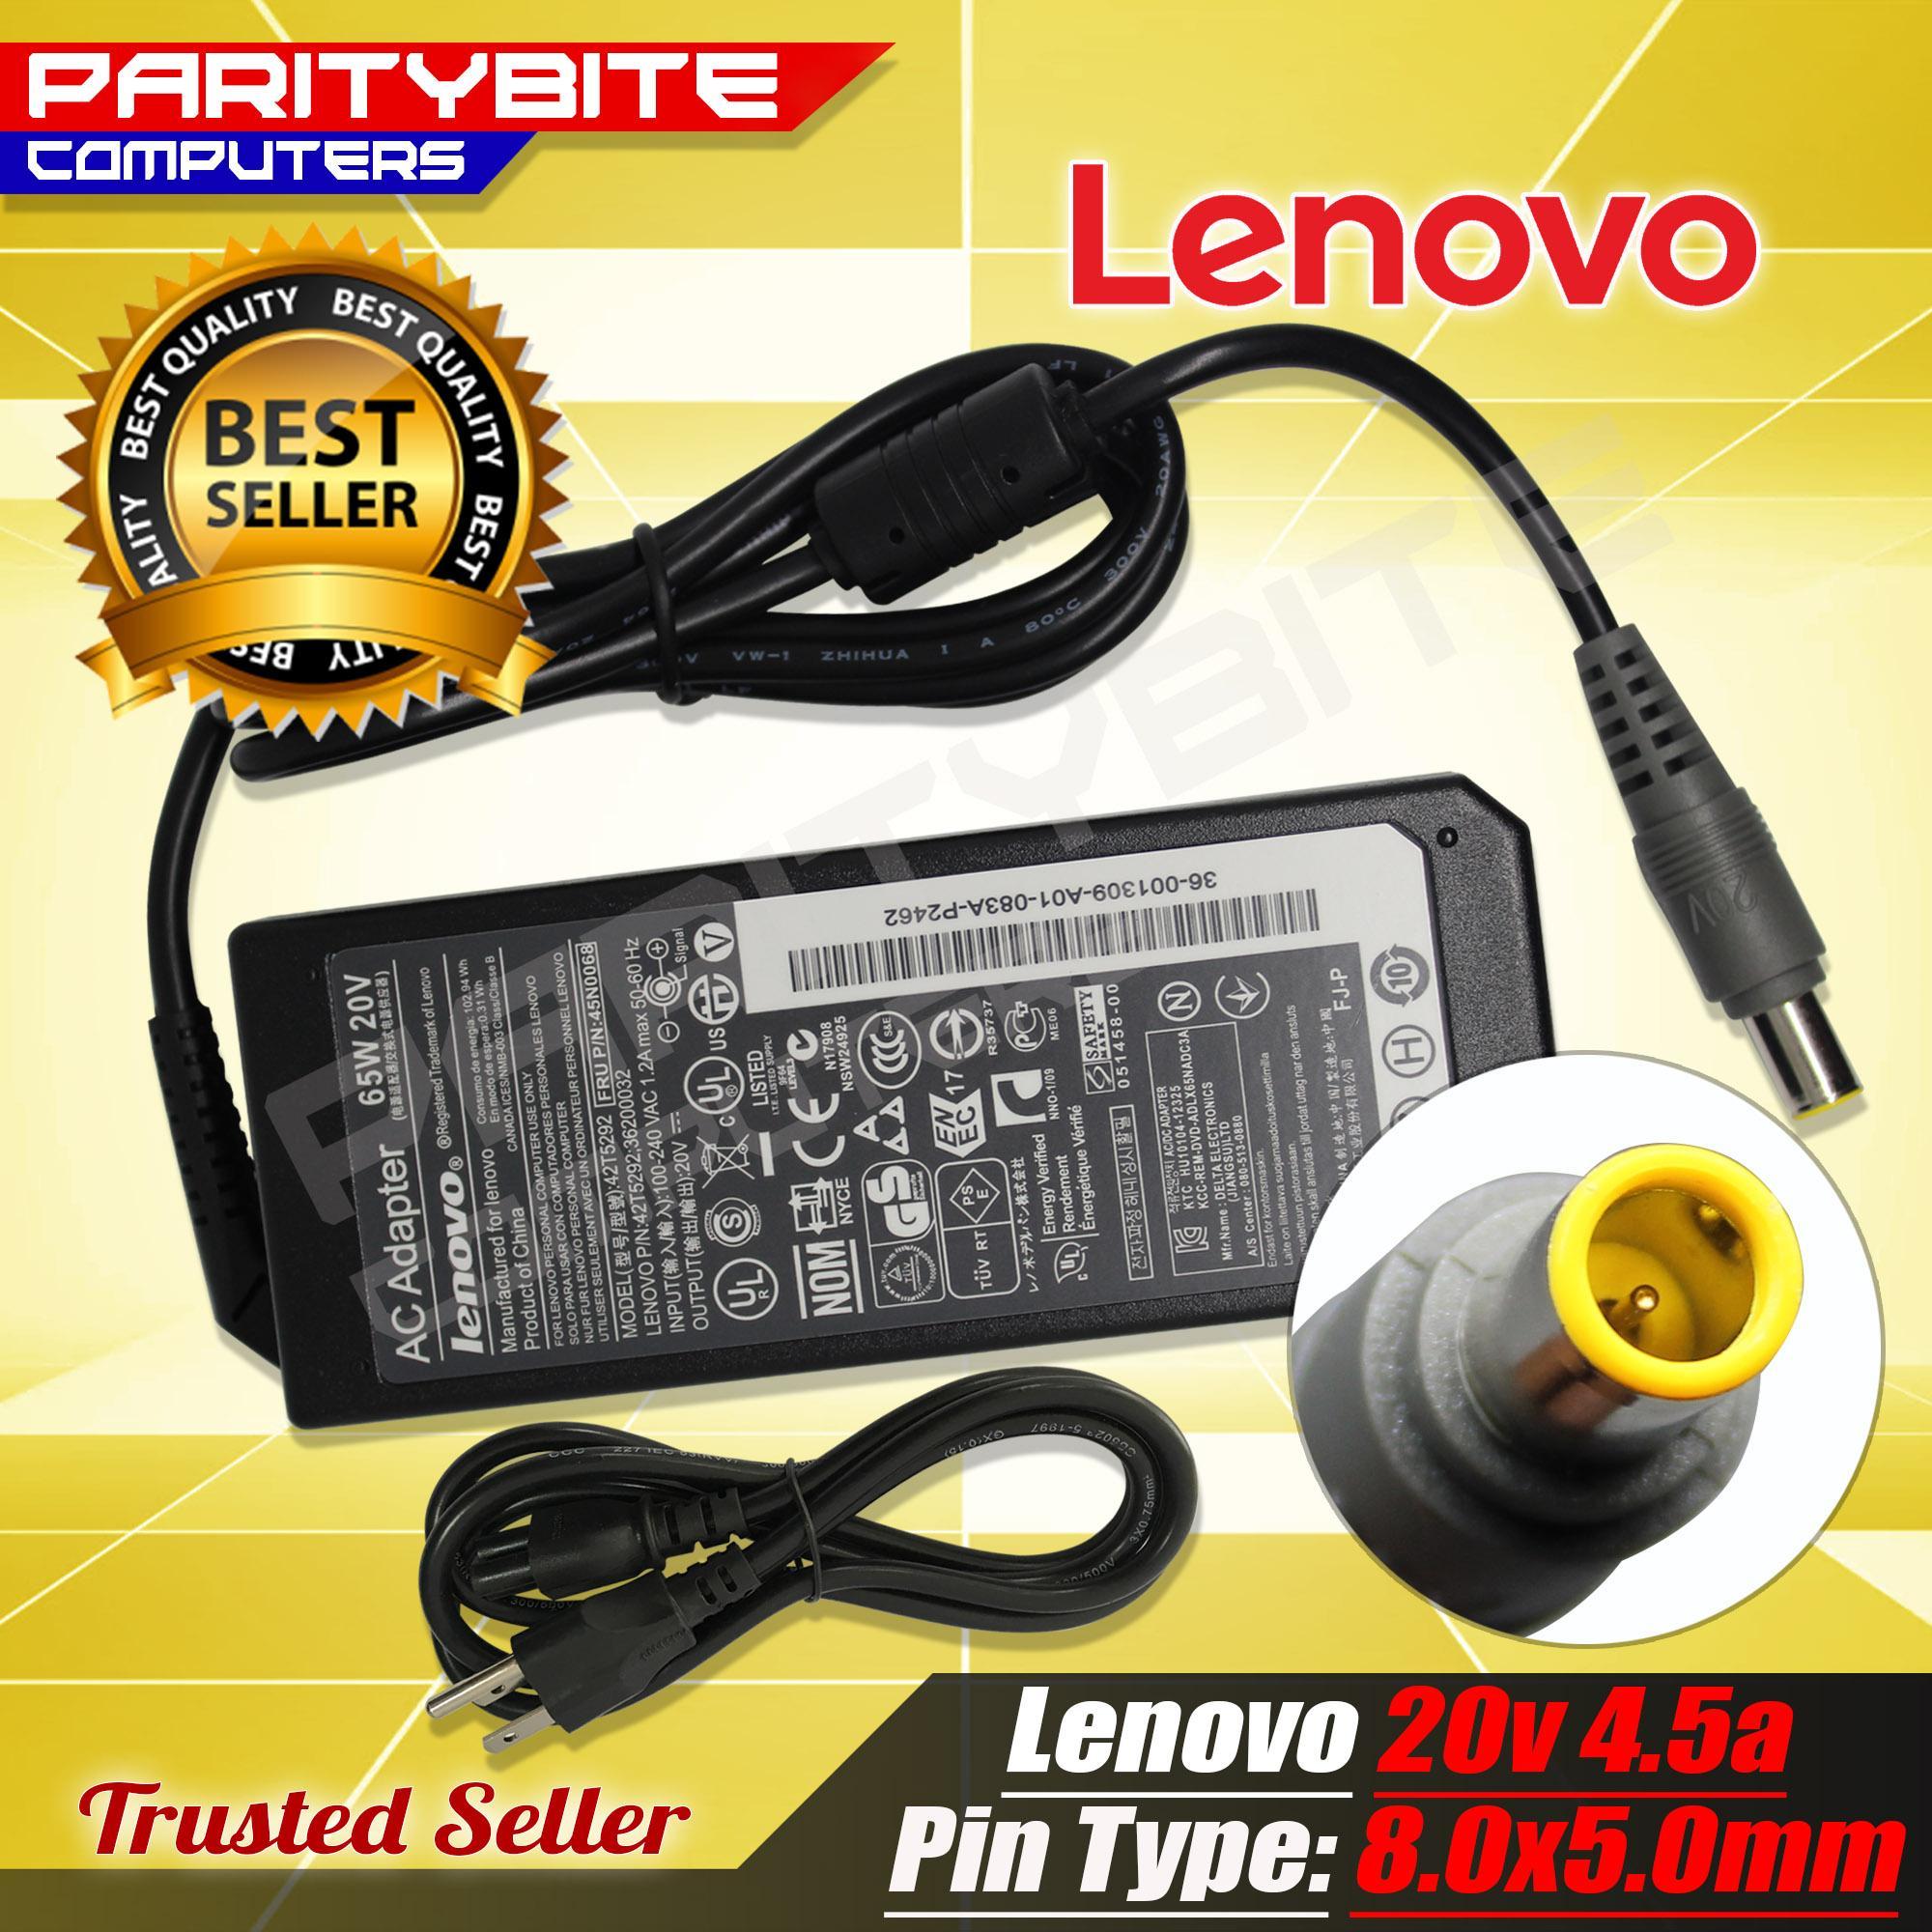 Aiek,Lenovo - Buy Aiek,Lenovo at Best Price in Philippines